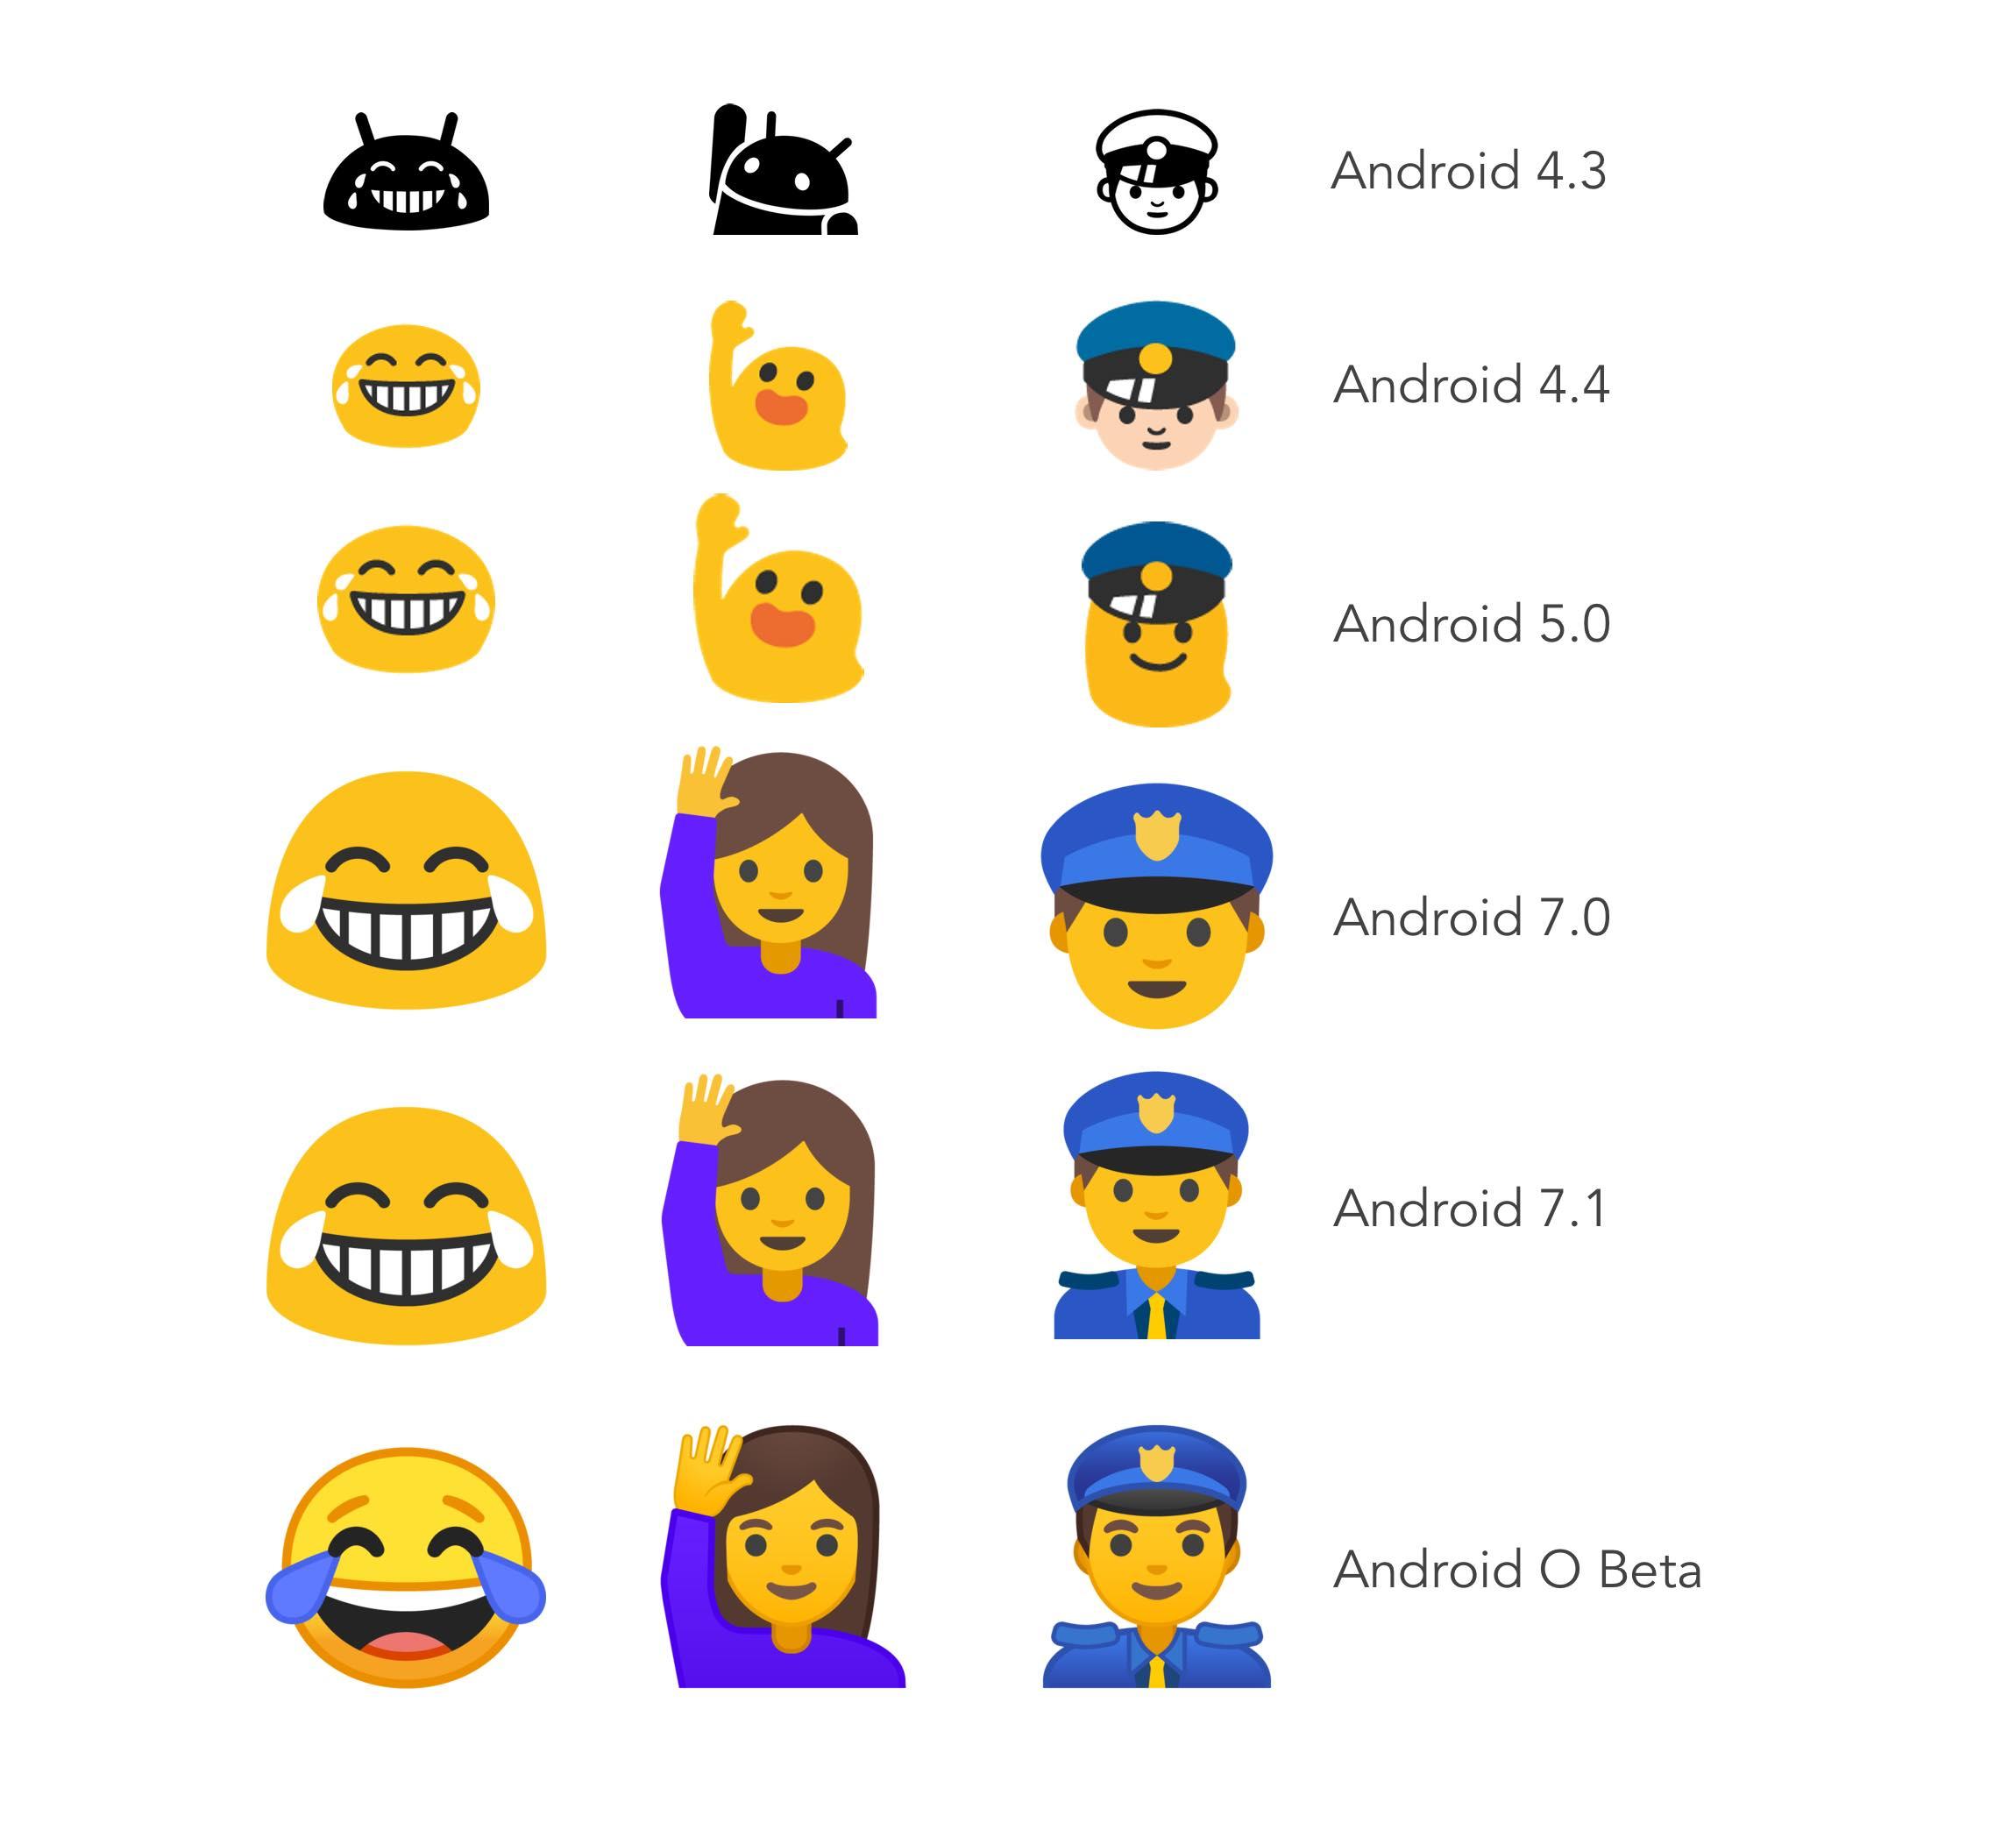 Google blob emojis download brings back cuteness - SlashGear